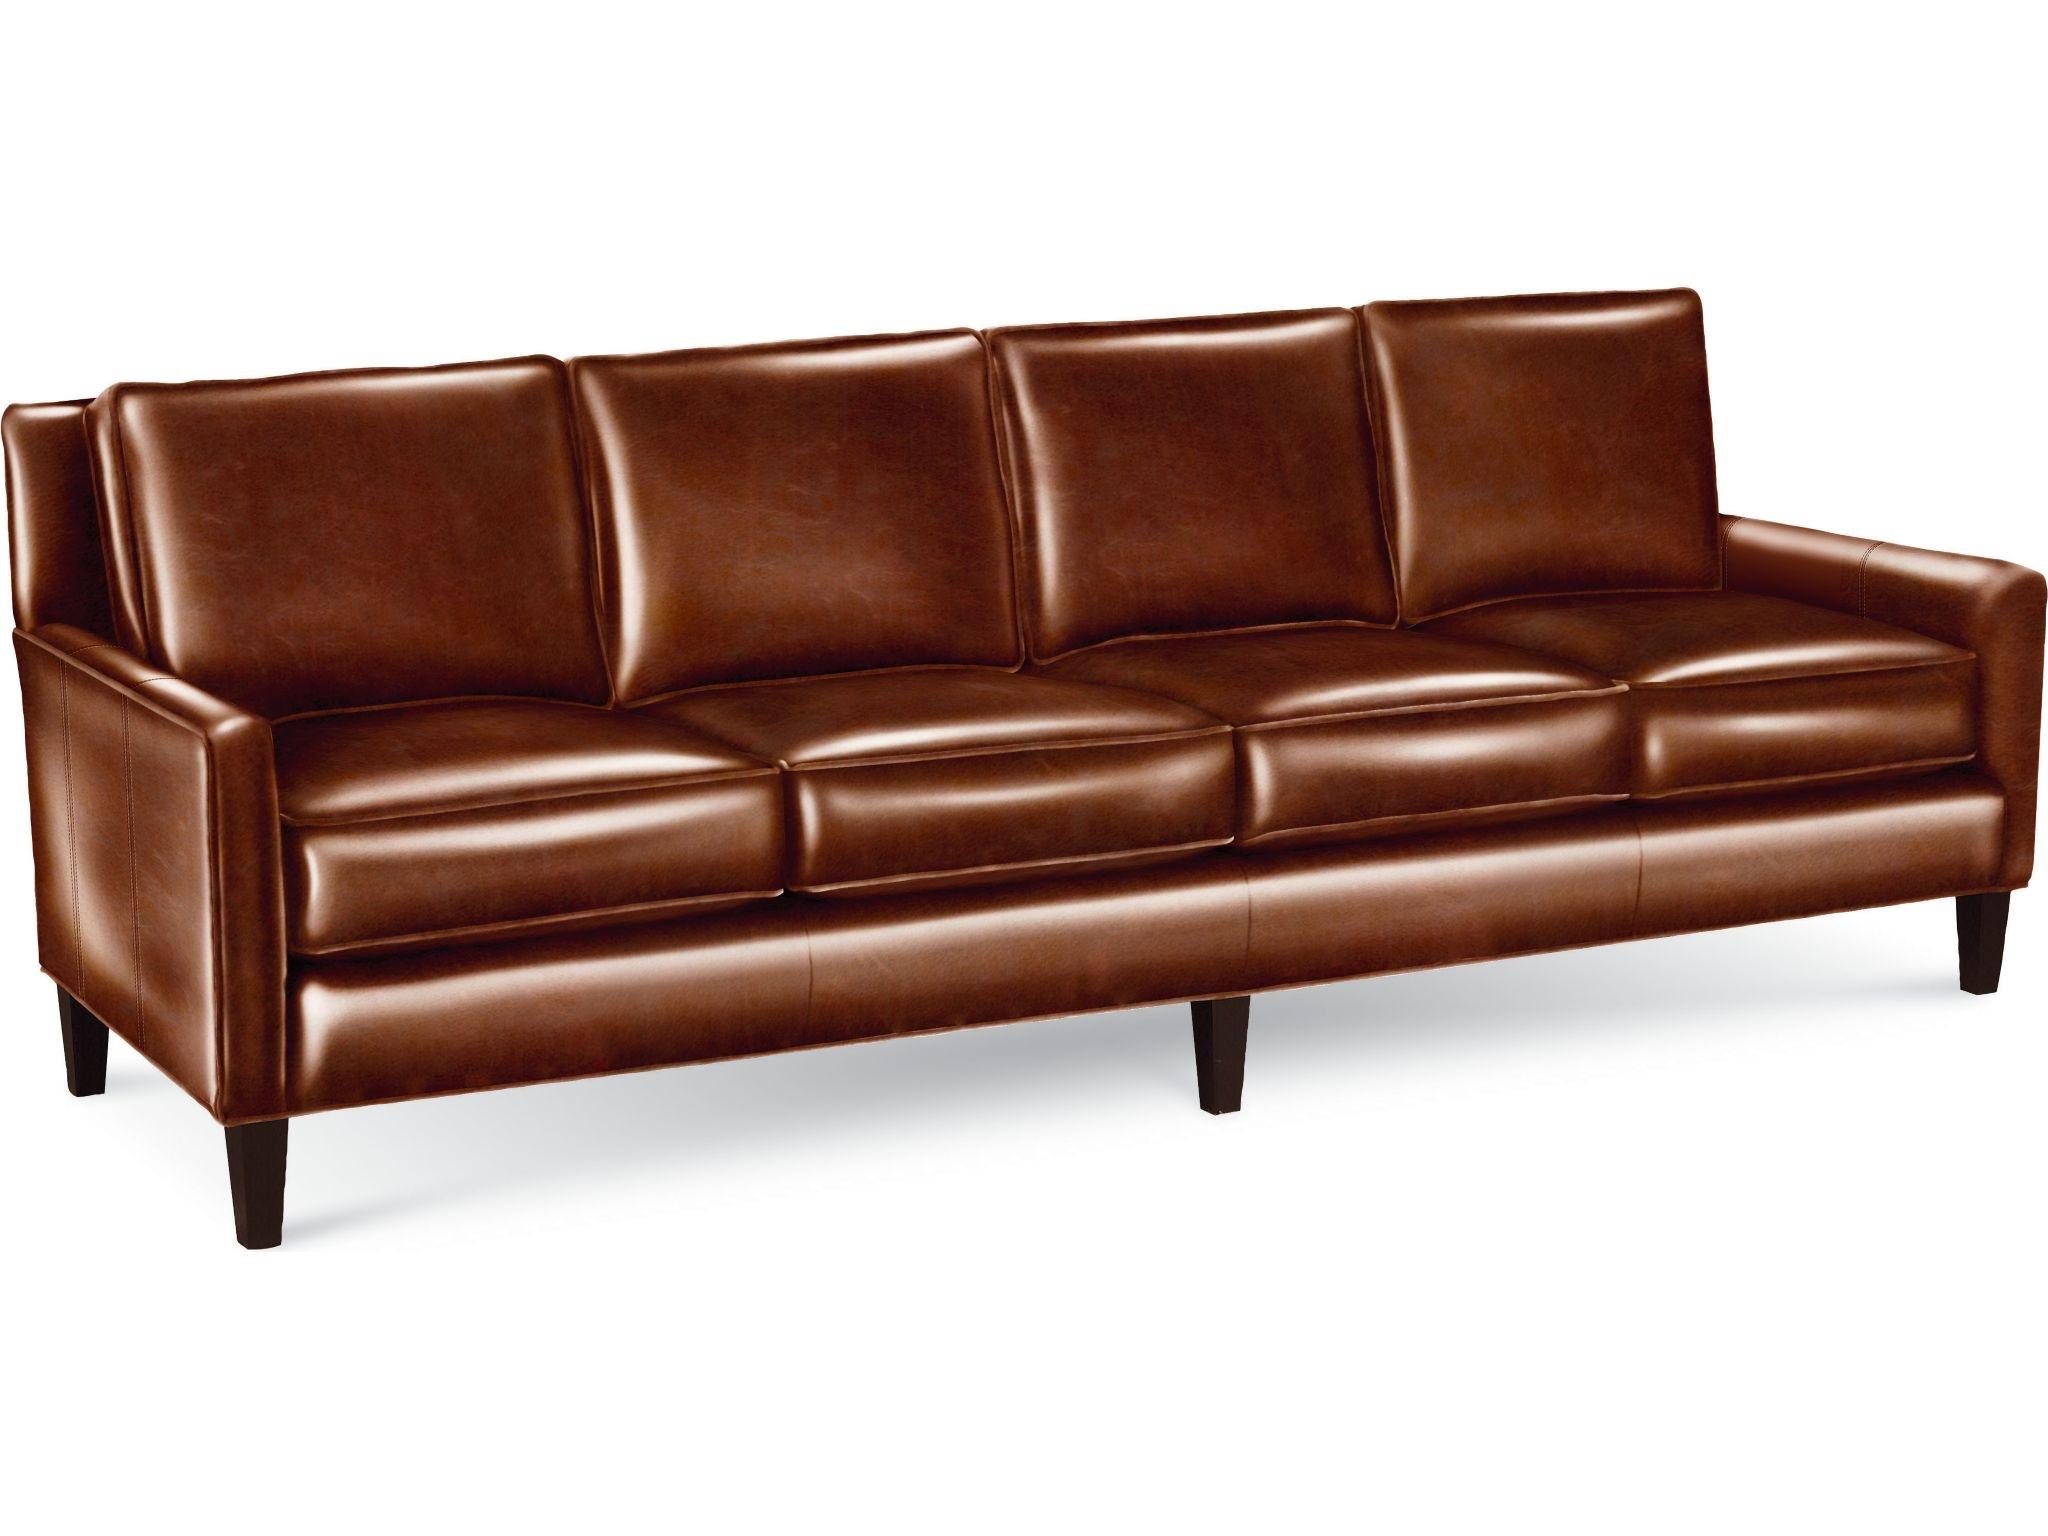 thomasville furniture hs7041 11 living room highlife 4 seat sofa rh goodshomefurnishings com Shenandoah Furniture Martinsville Virginia Shenandoah Valley Furniture